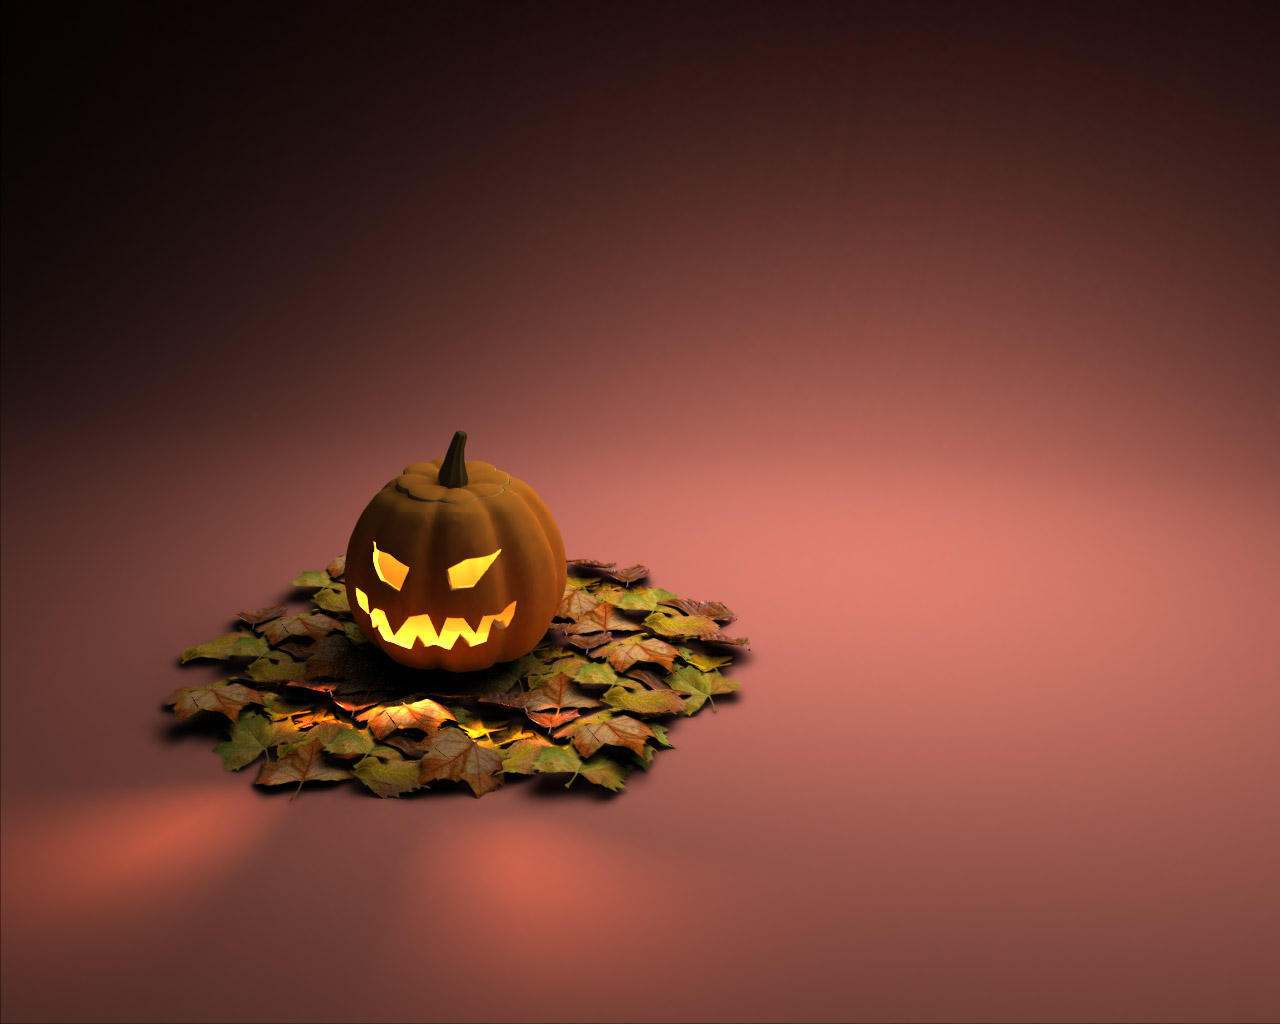 Halloween 2005 by bartholomew